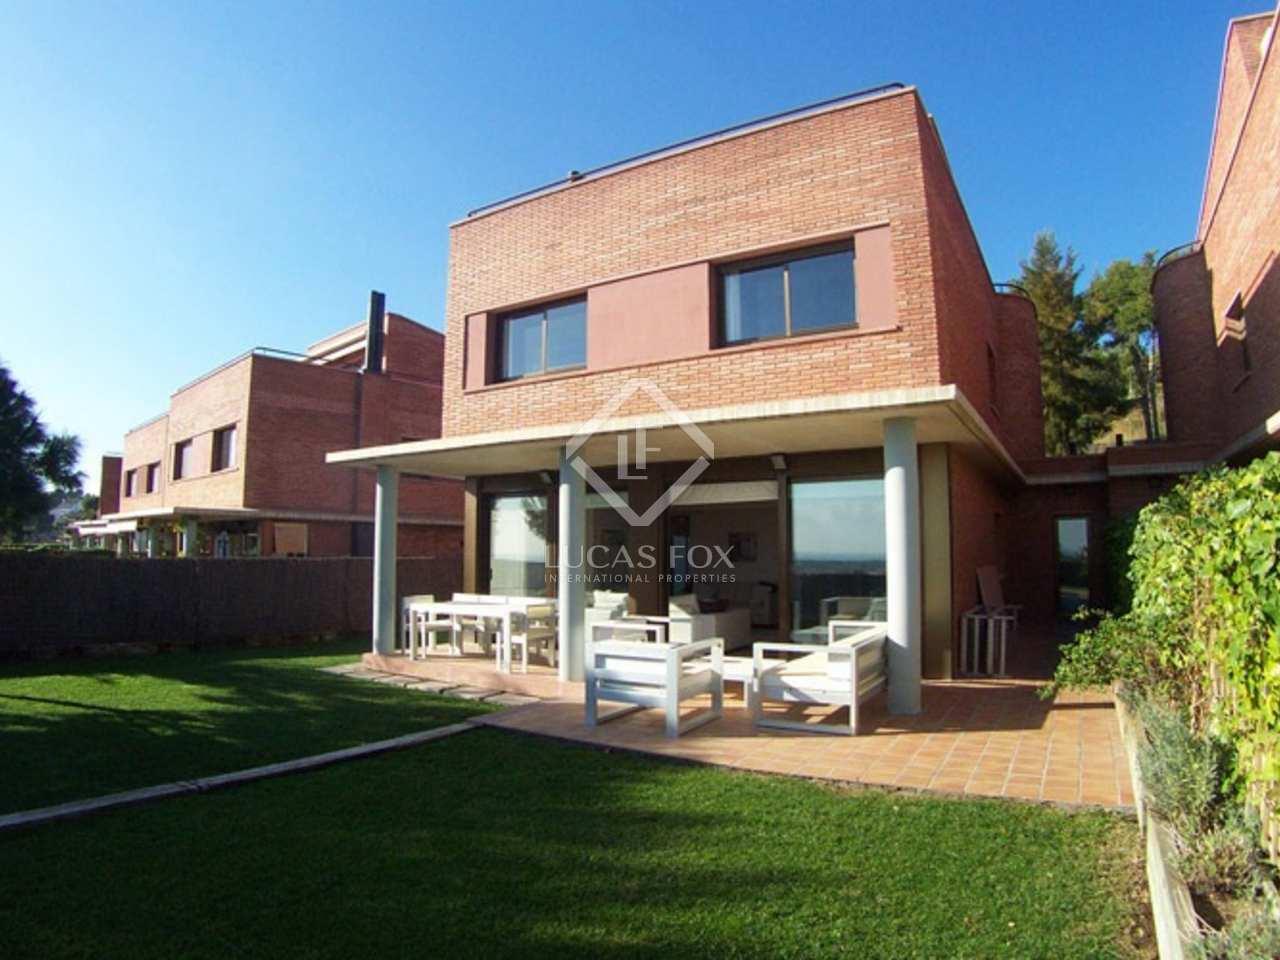 maison villa de 500m a vendre castelldefels barcelone. Black Bedroom Furniture Sets. Home Design Ideas